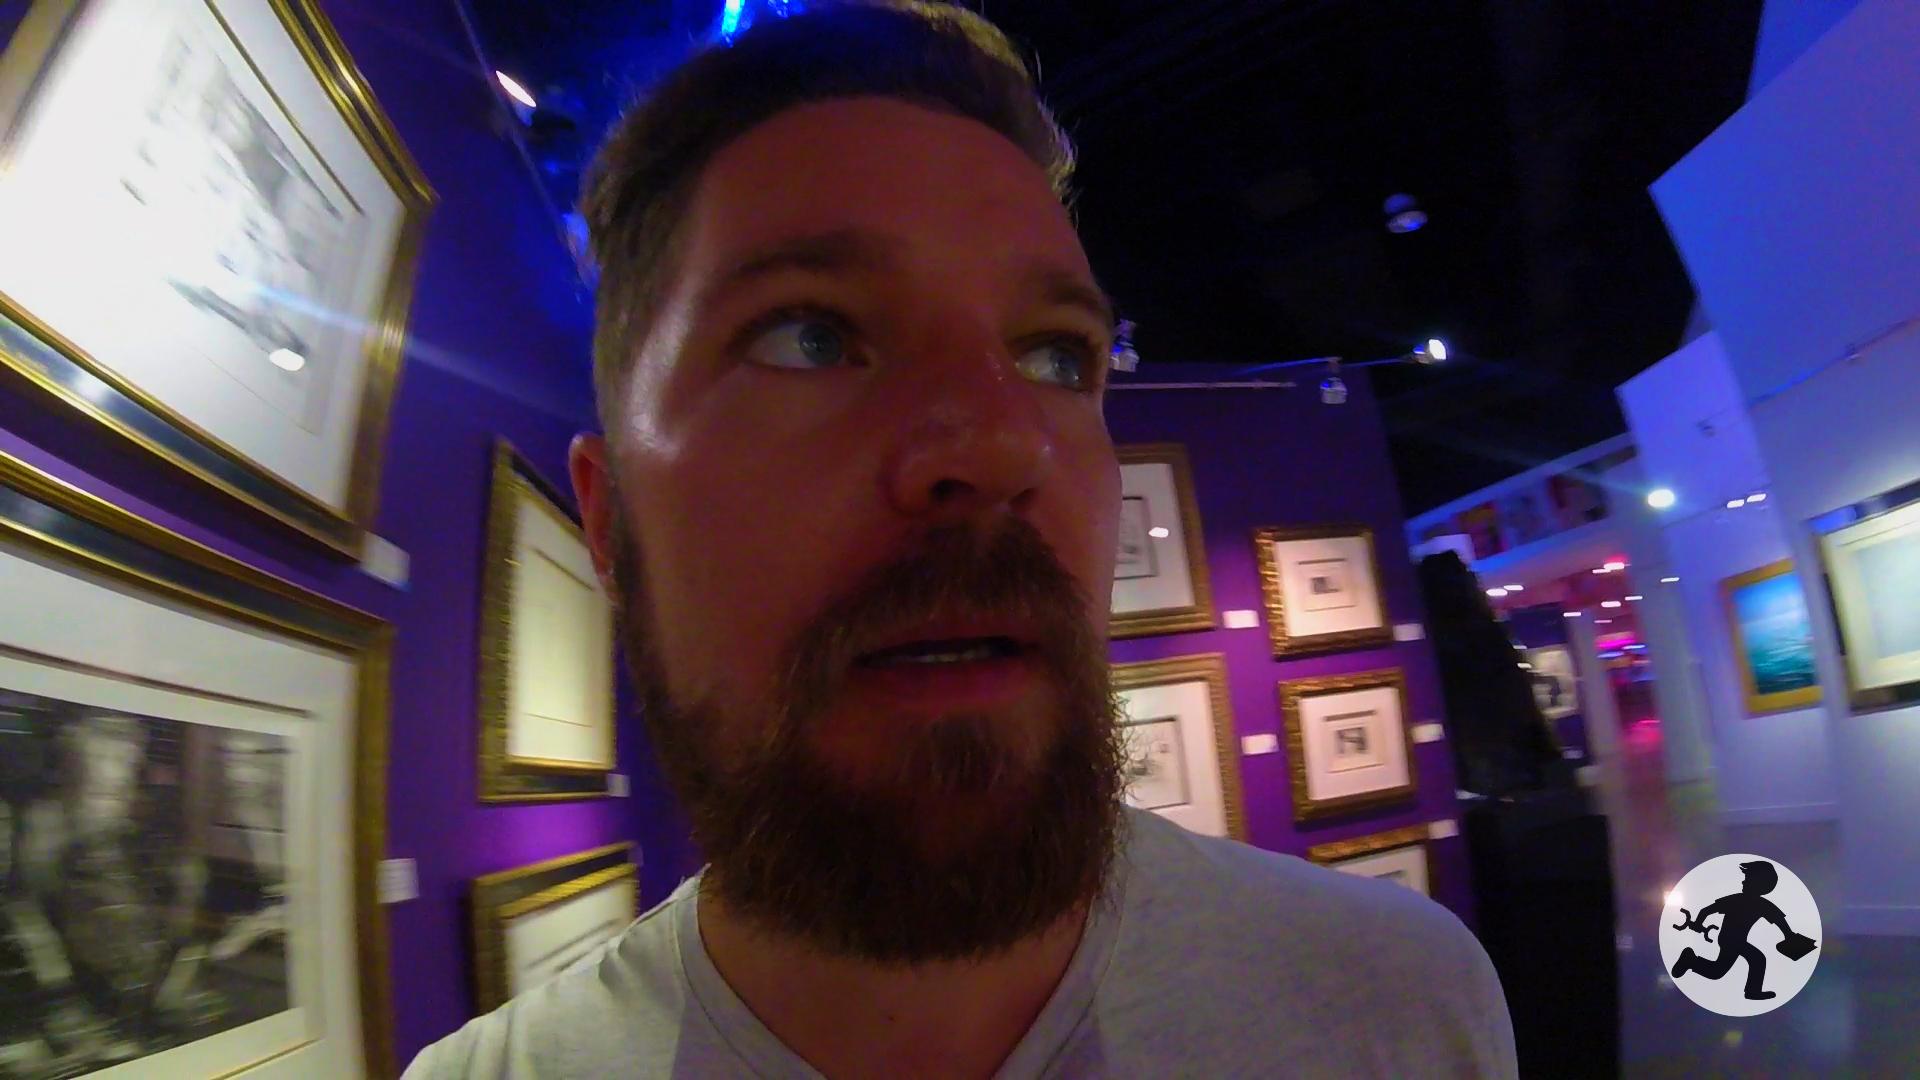 Vegas 2016 - Art Exhibit